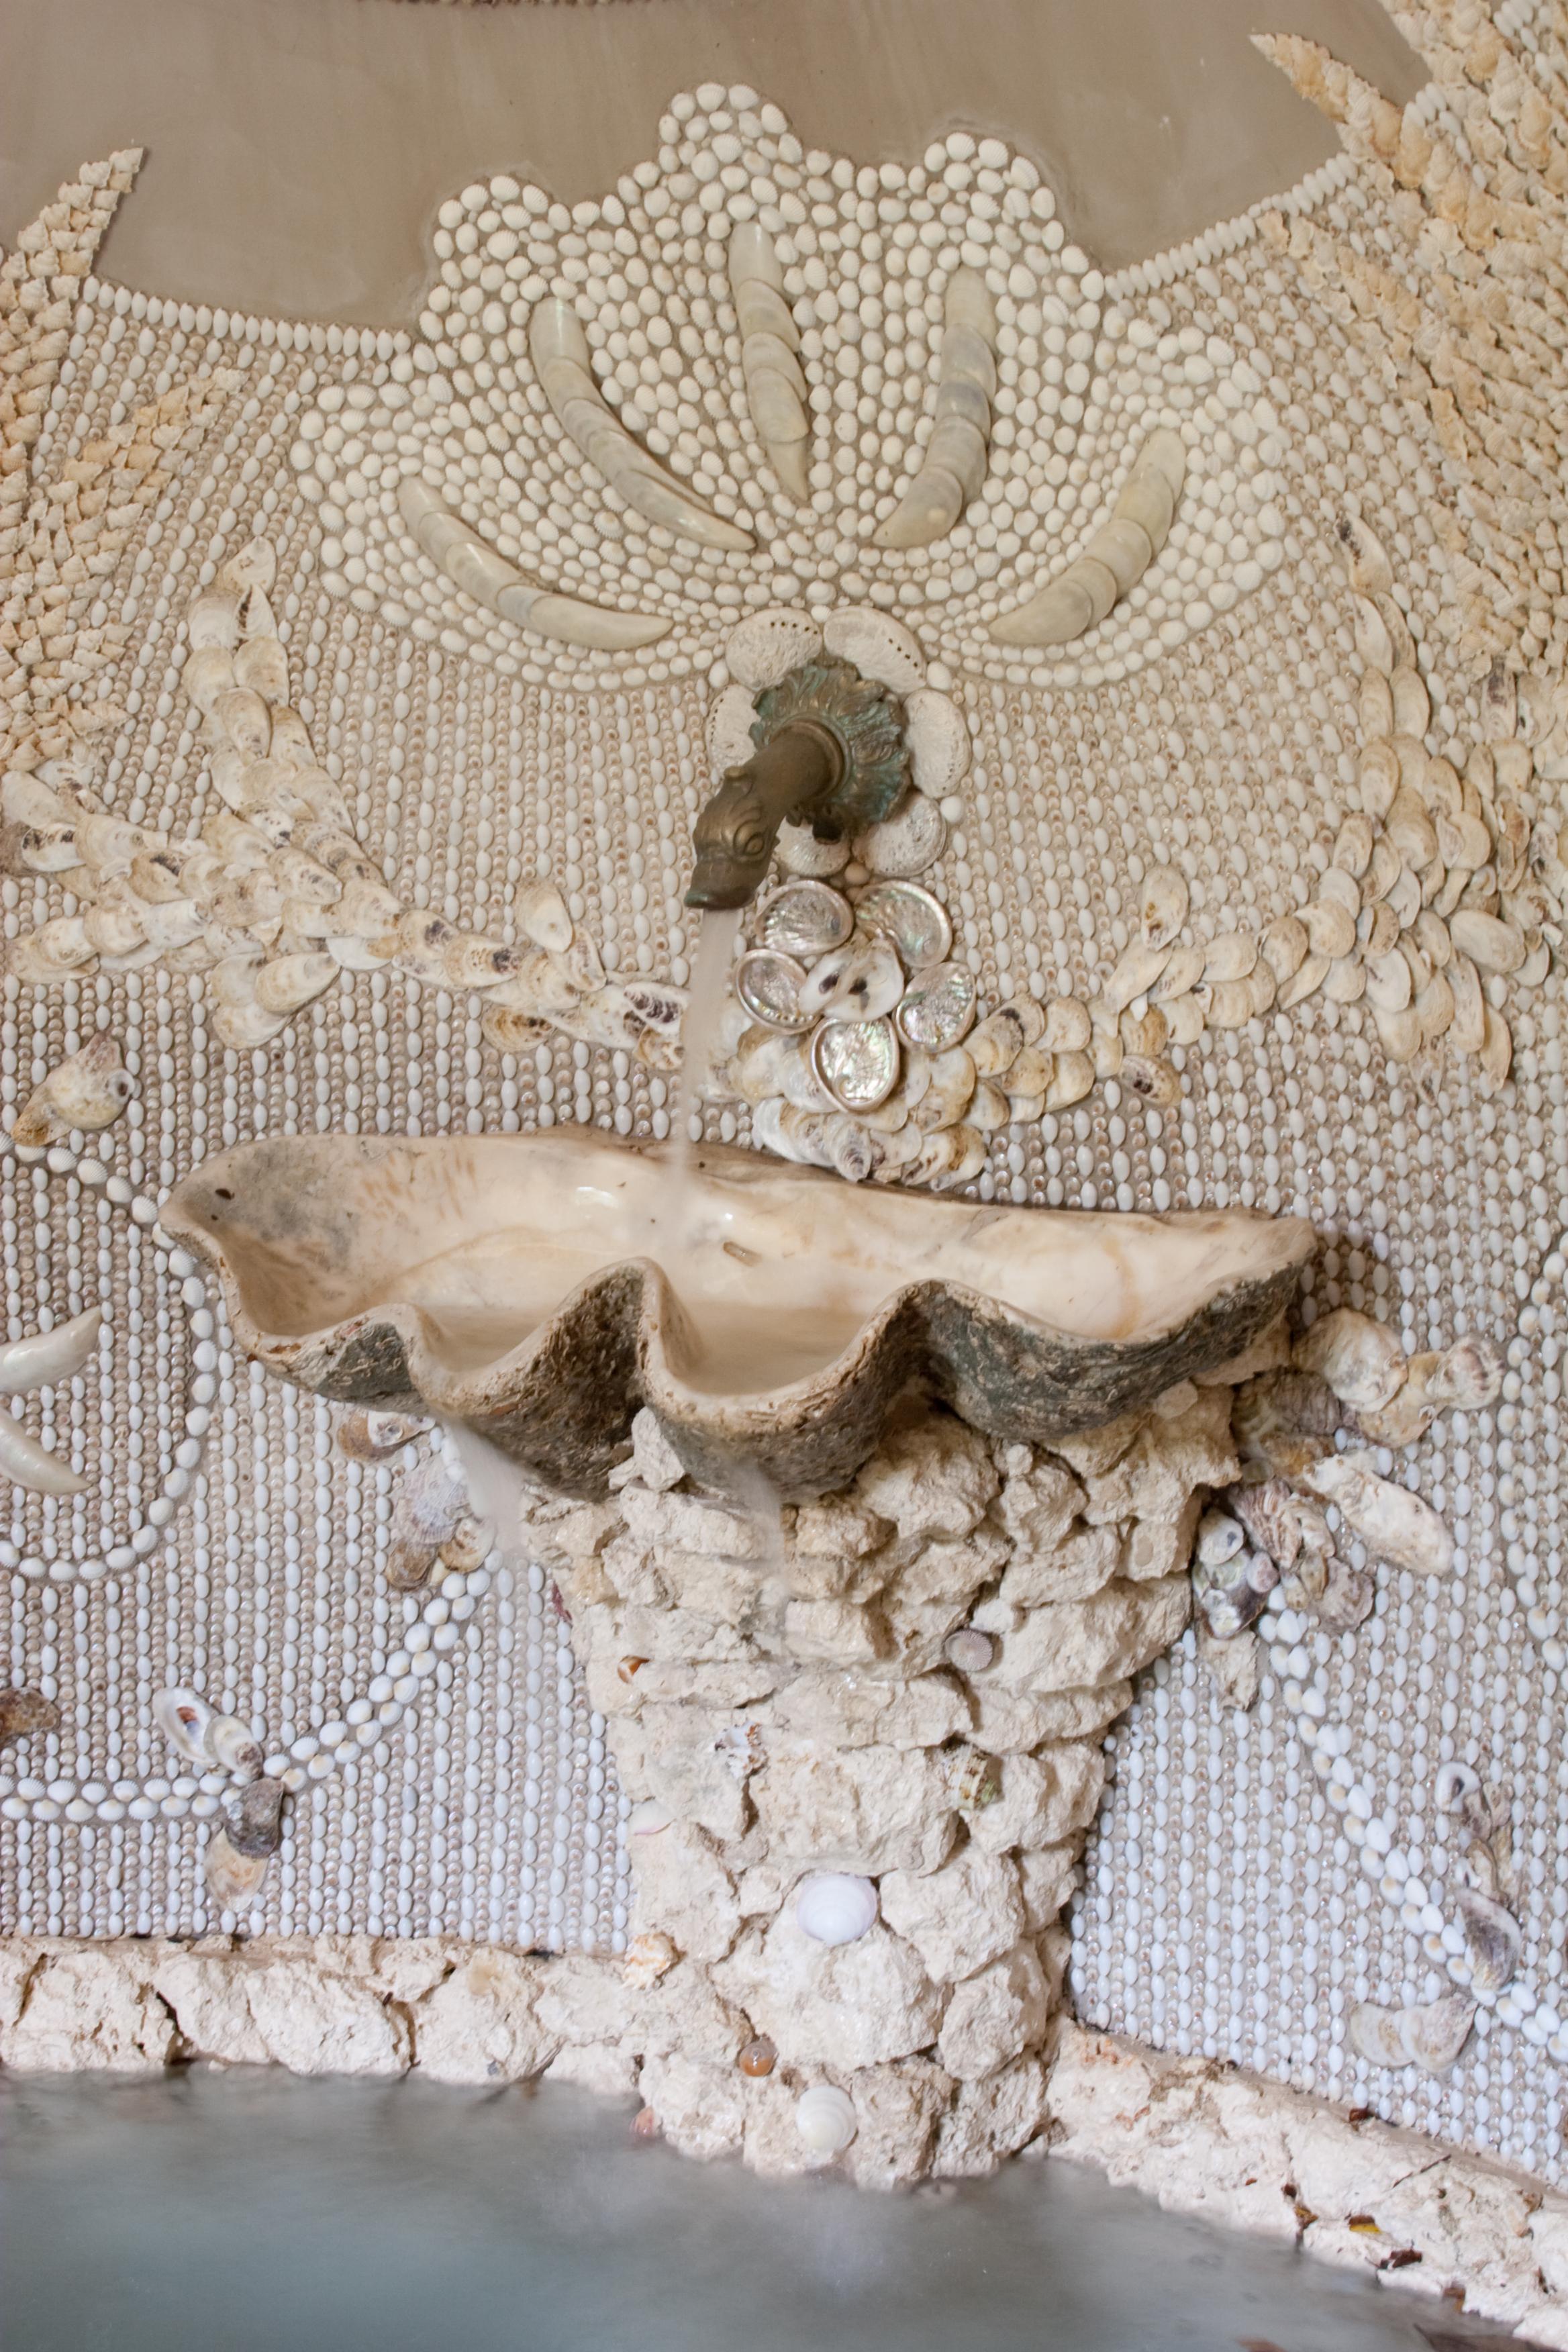 Shell Grotto 10 winn grotto 034.jpg